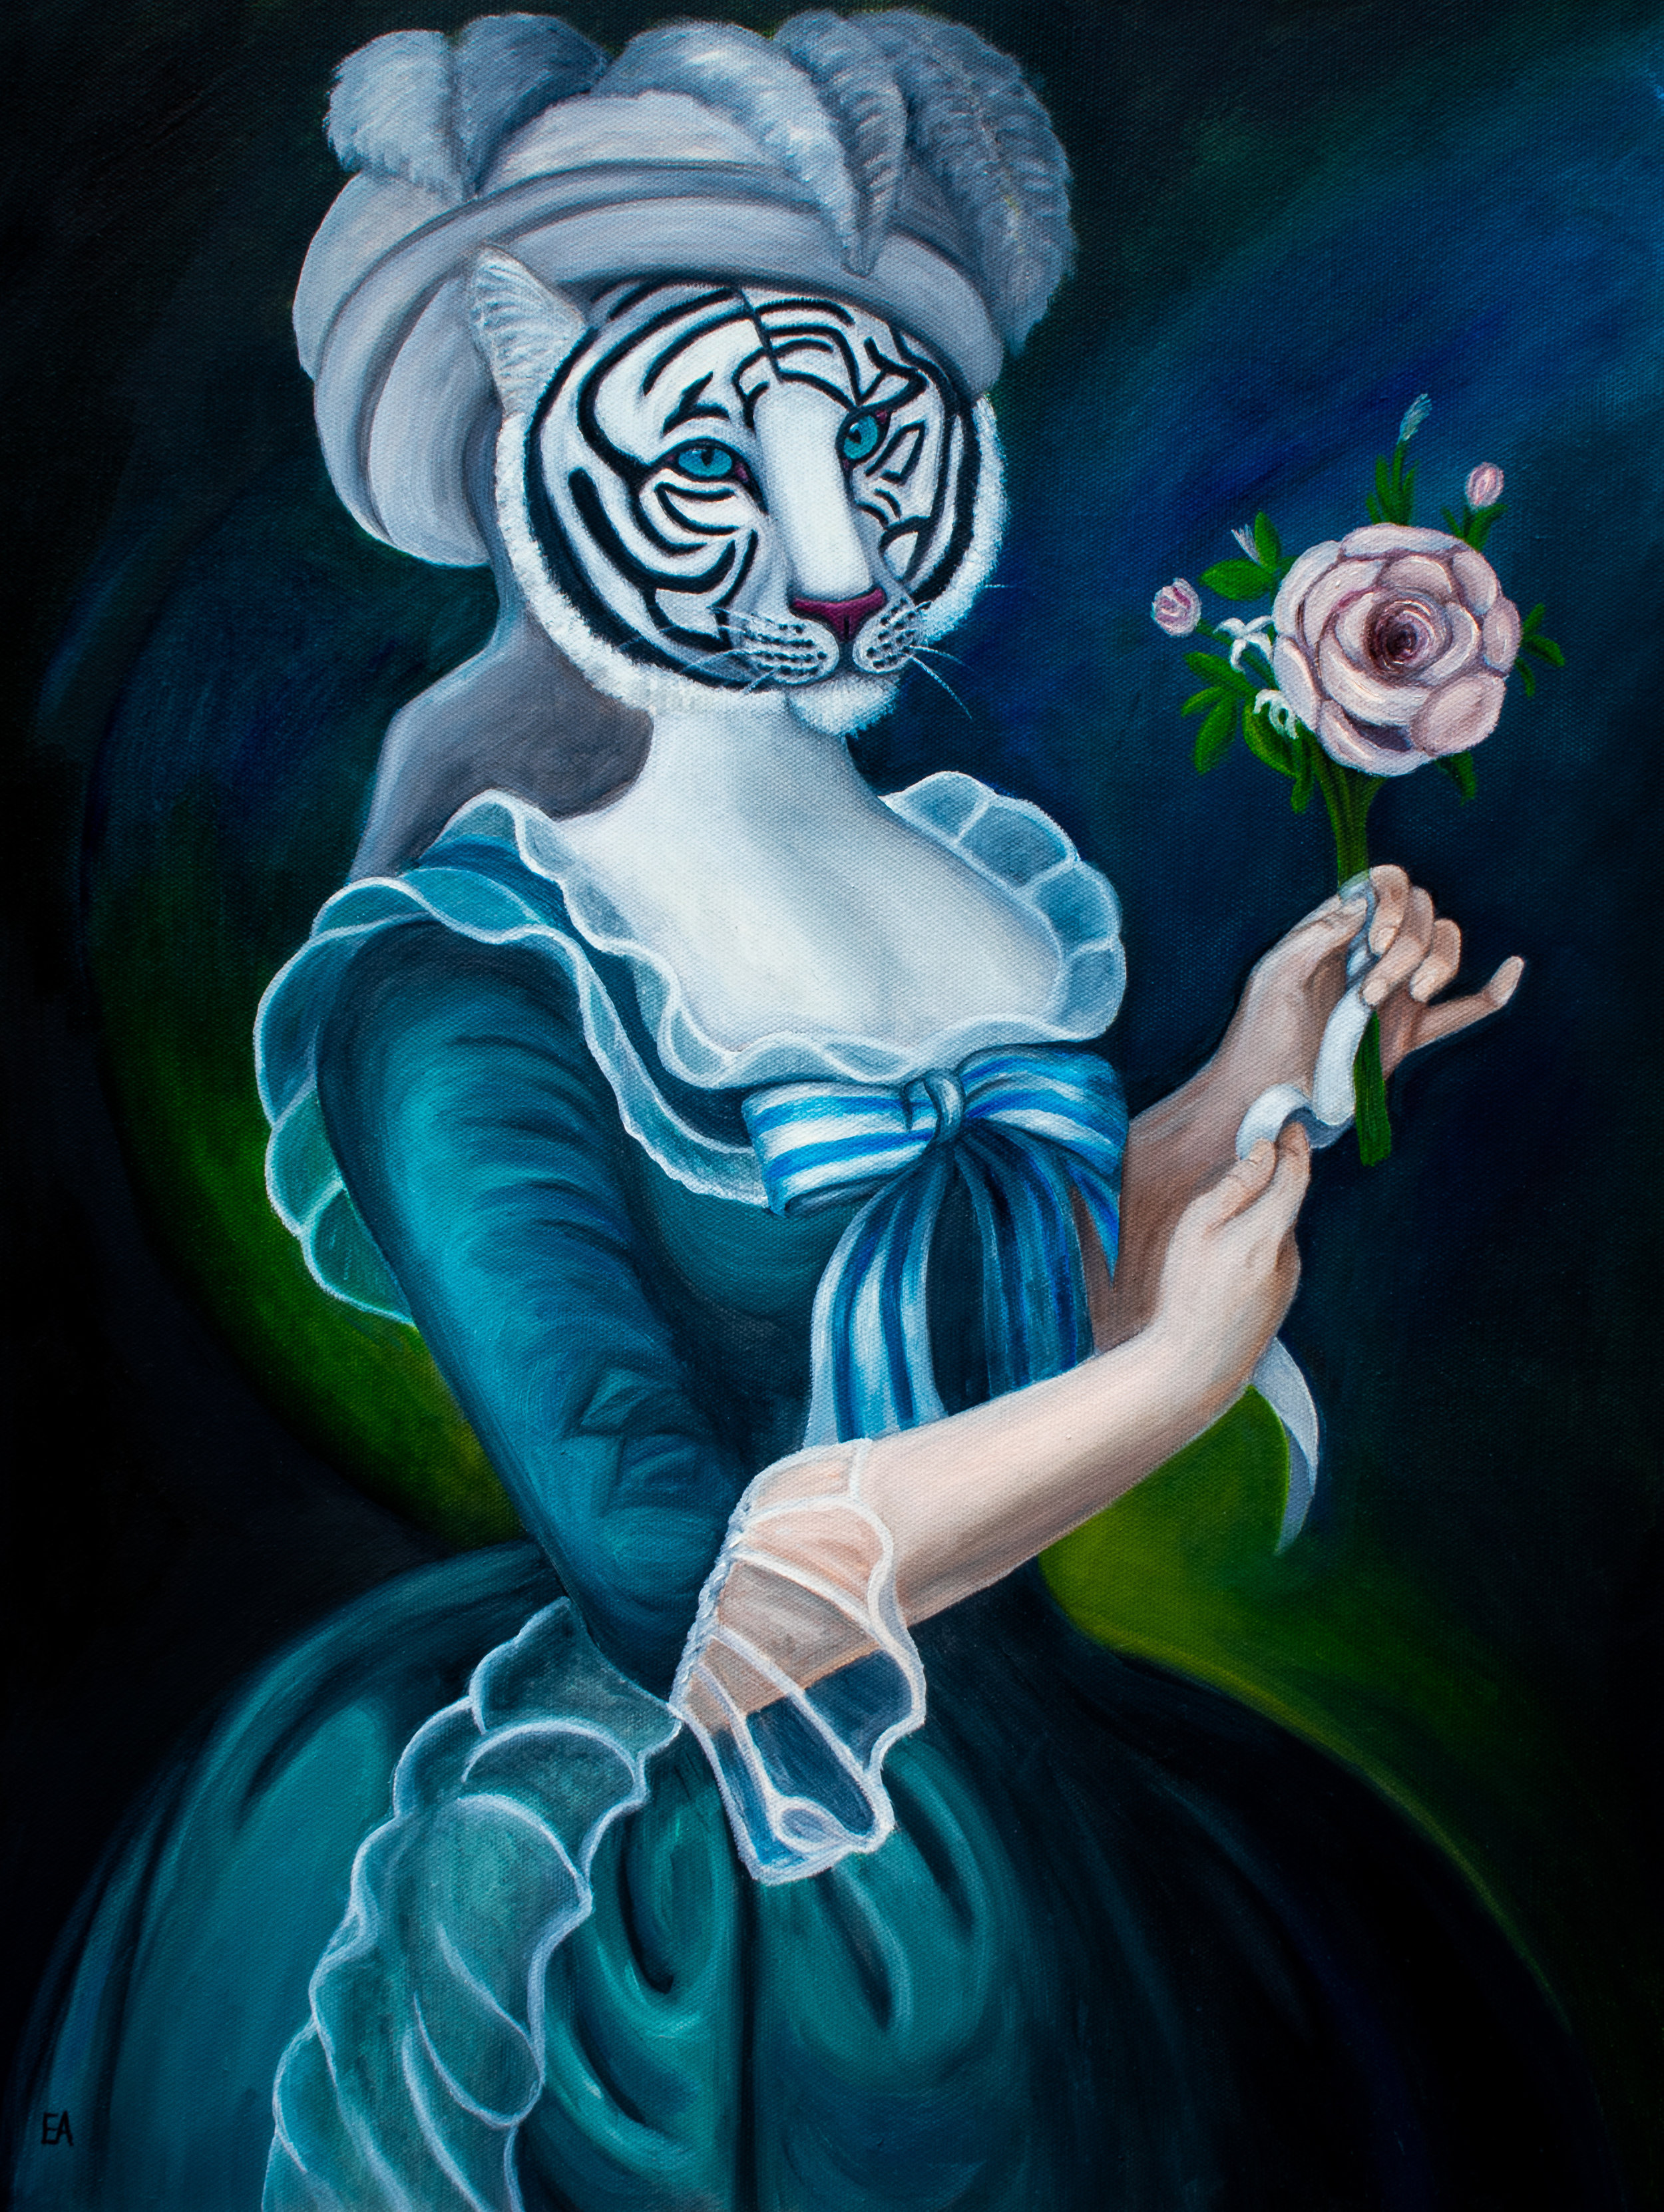 """The Portrait of Marie Antoinette"" inspired by the Élisabeth Vigée Le Brun painting (1783)."